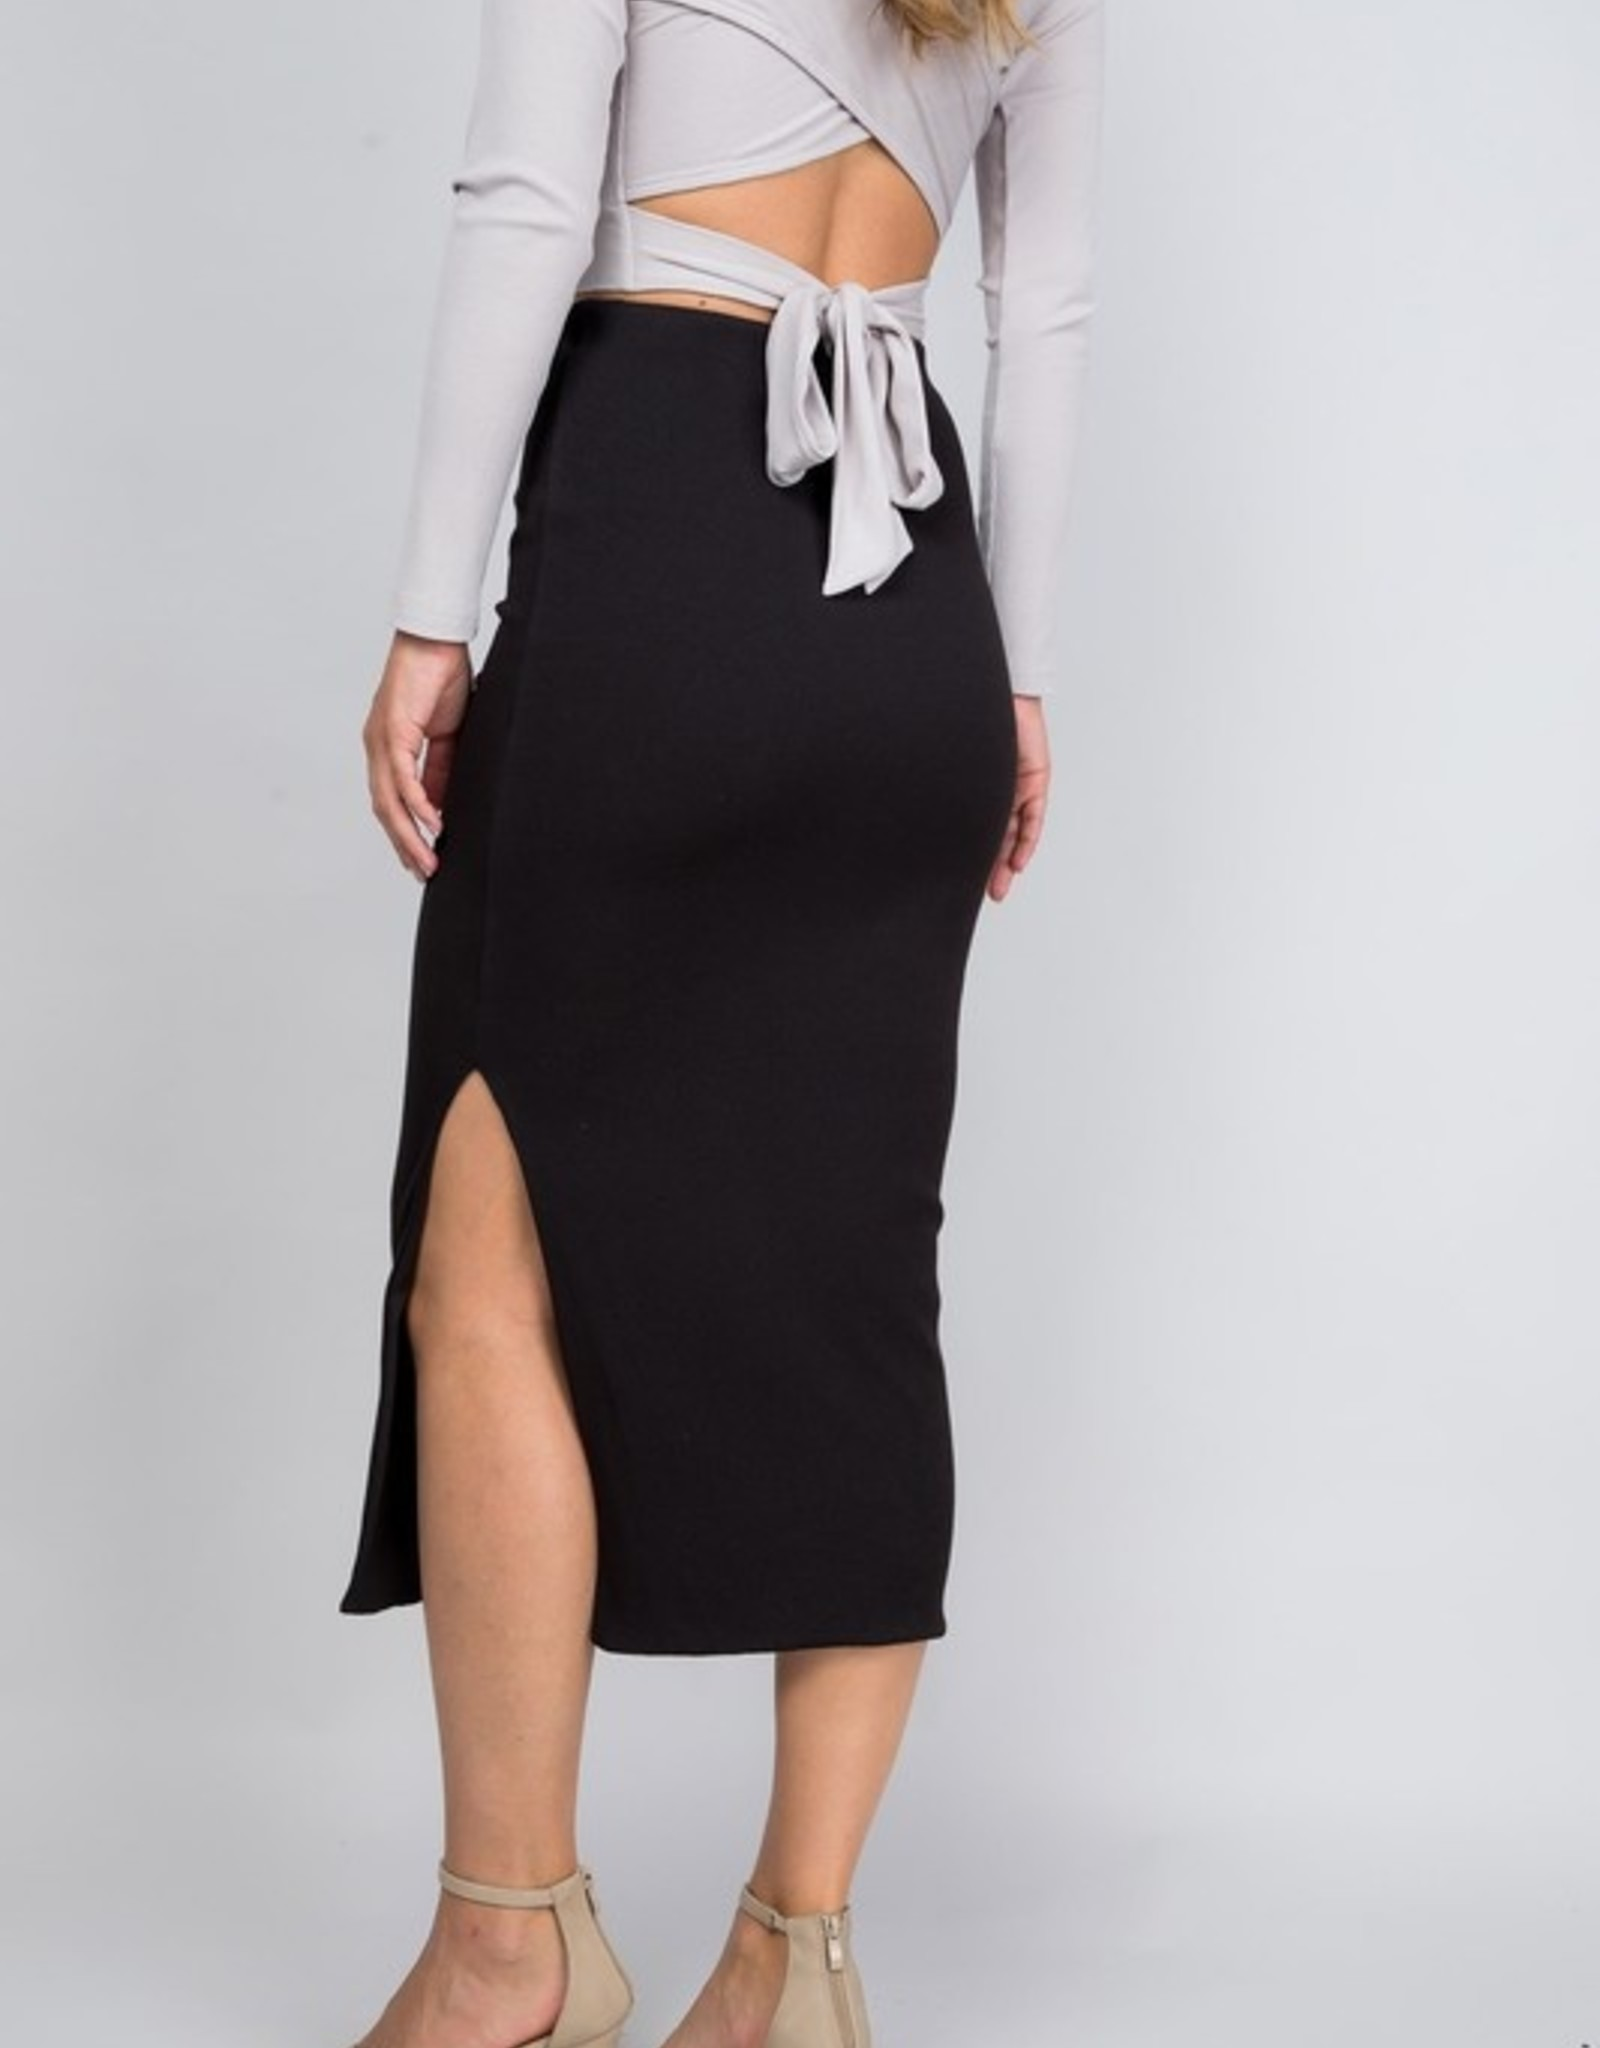 Pencil Me In Skirt